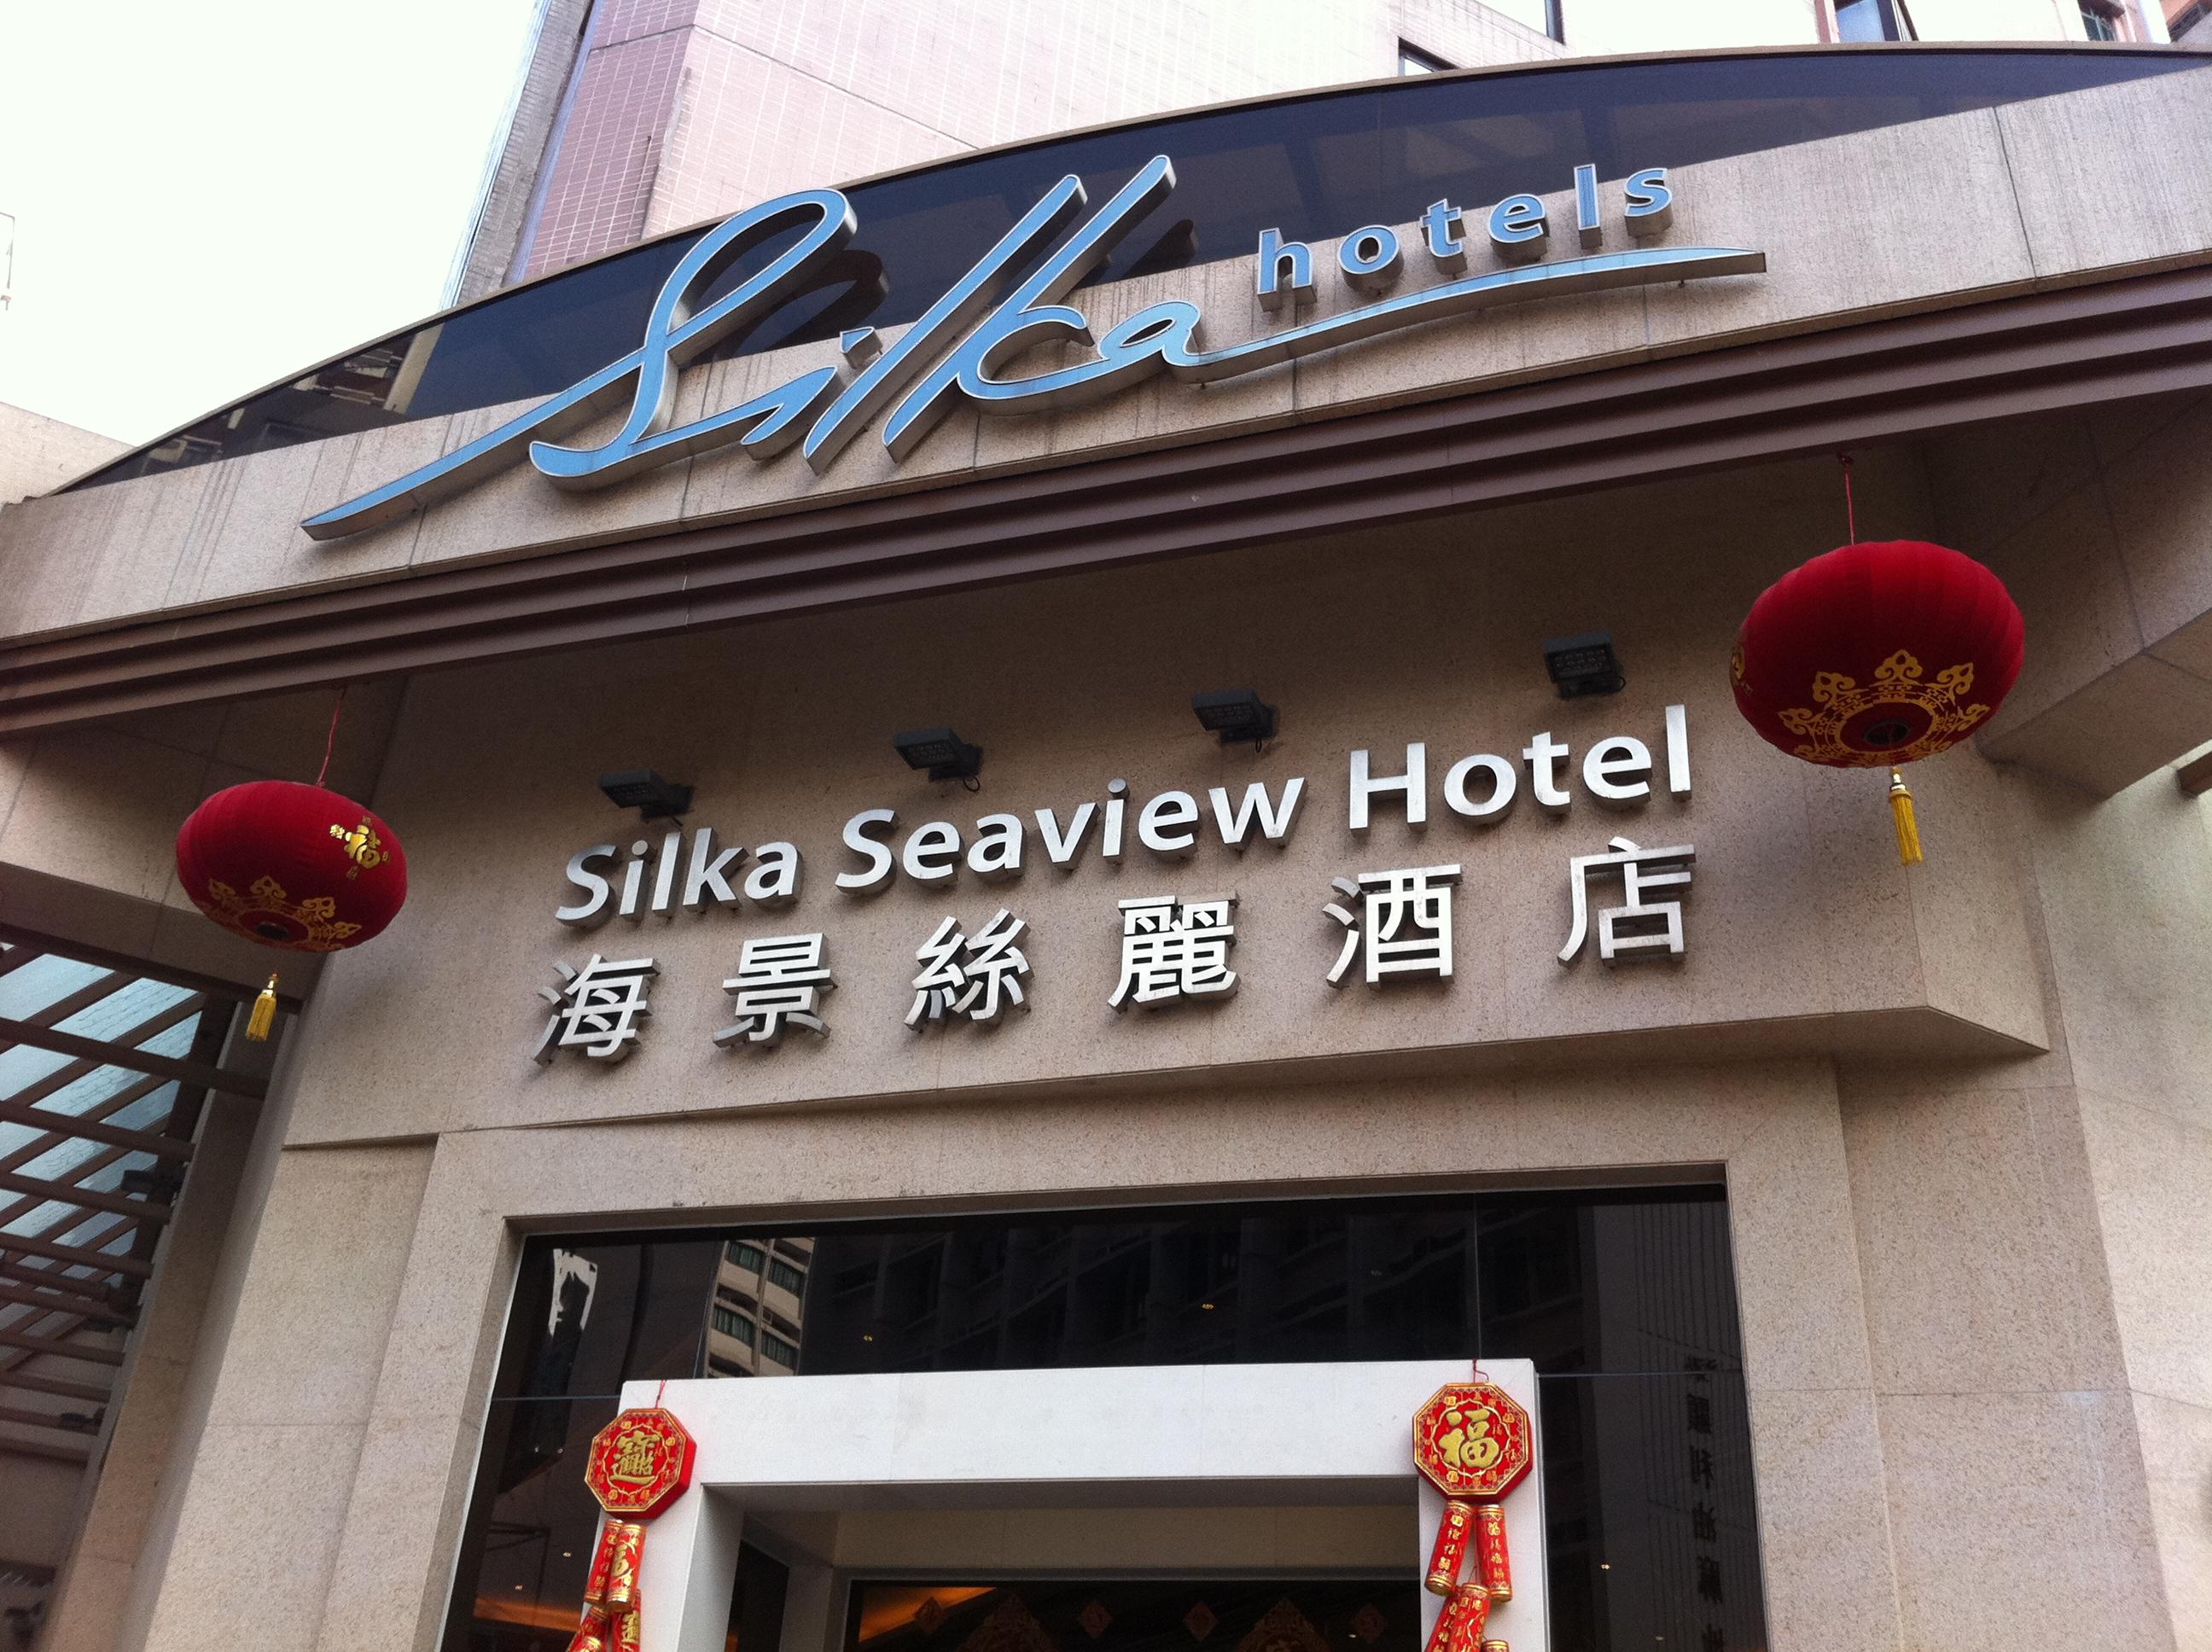 File Hk Yau Ma Tei 油麻地 268 Shanghai Street 上海街 Public Square Silka